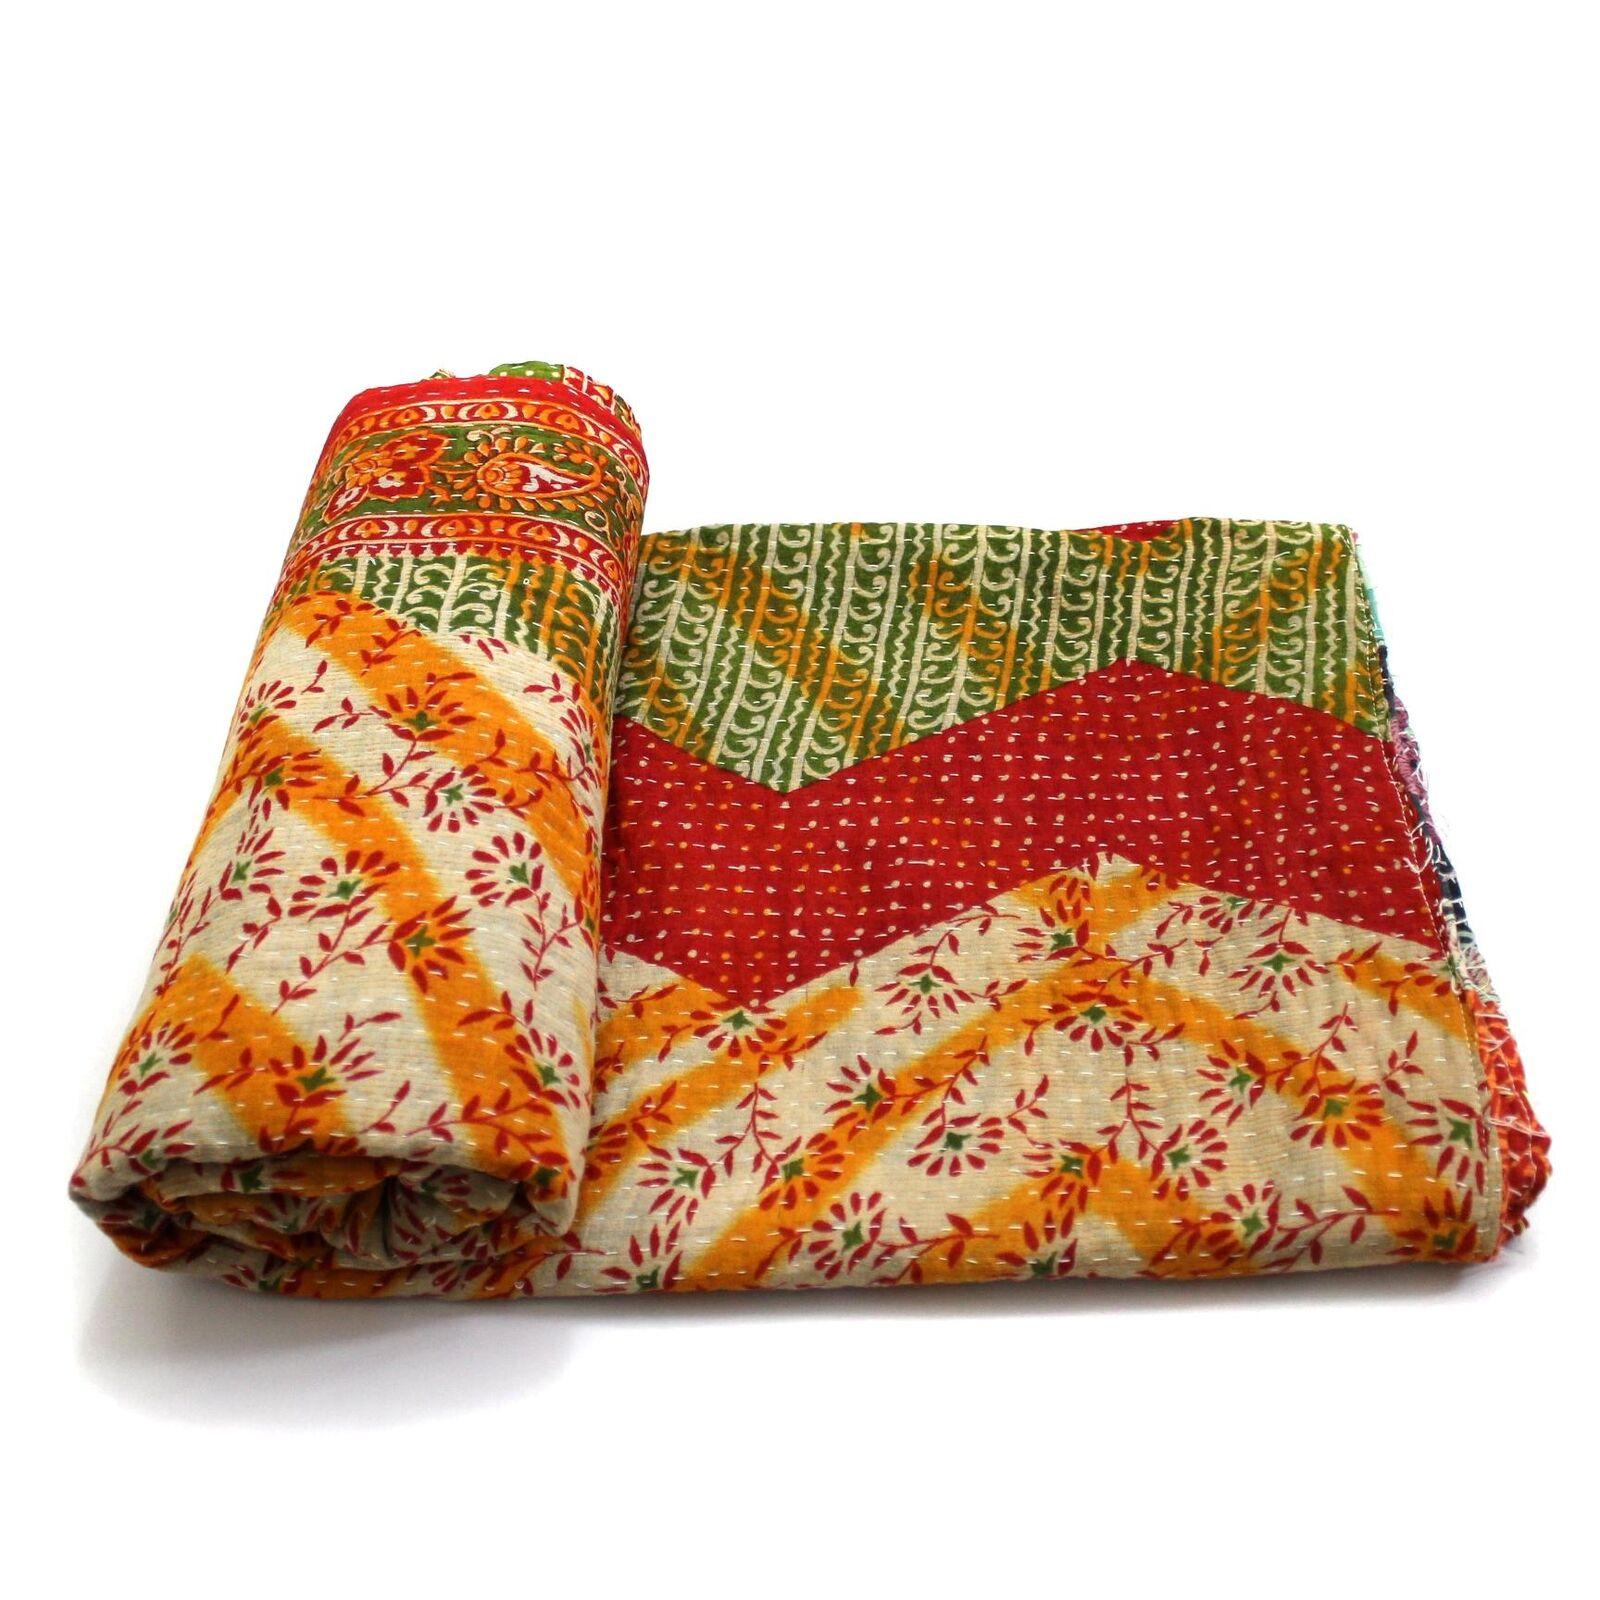 Vintage Kantha Quilt Indian Handmade Cotton Bedspread Sashiko Throw Bedding